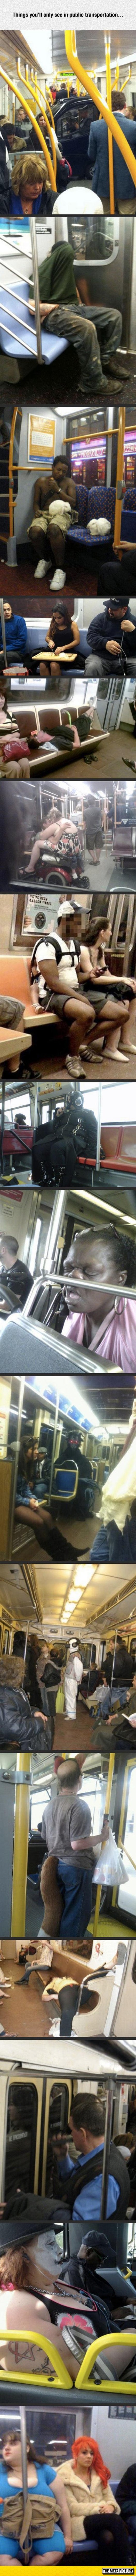 cool-bus-subway-people-creepy